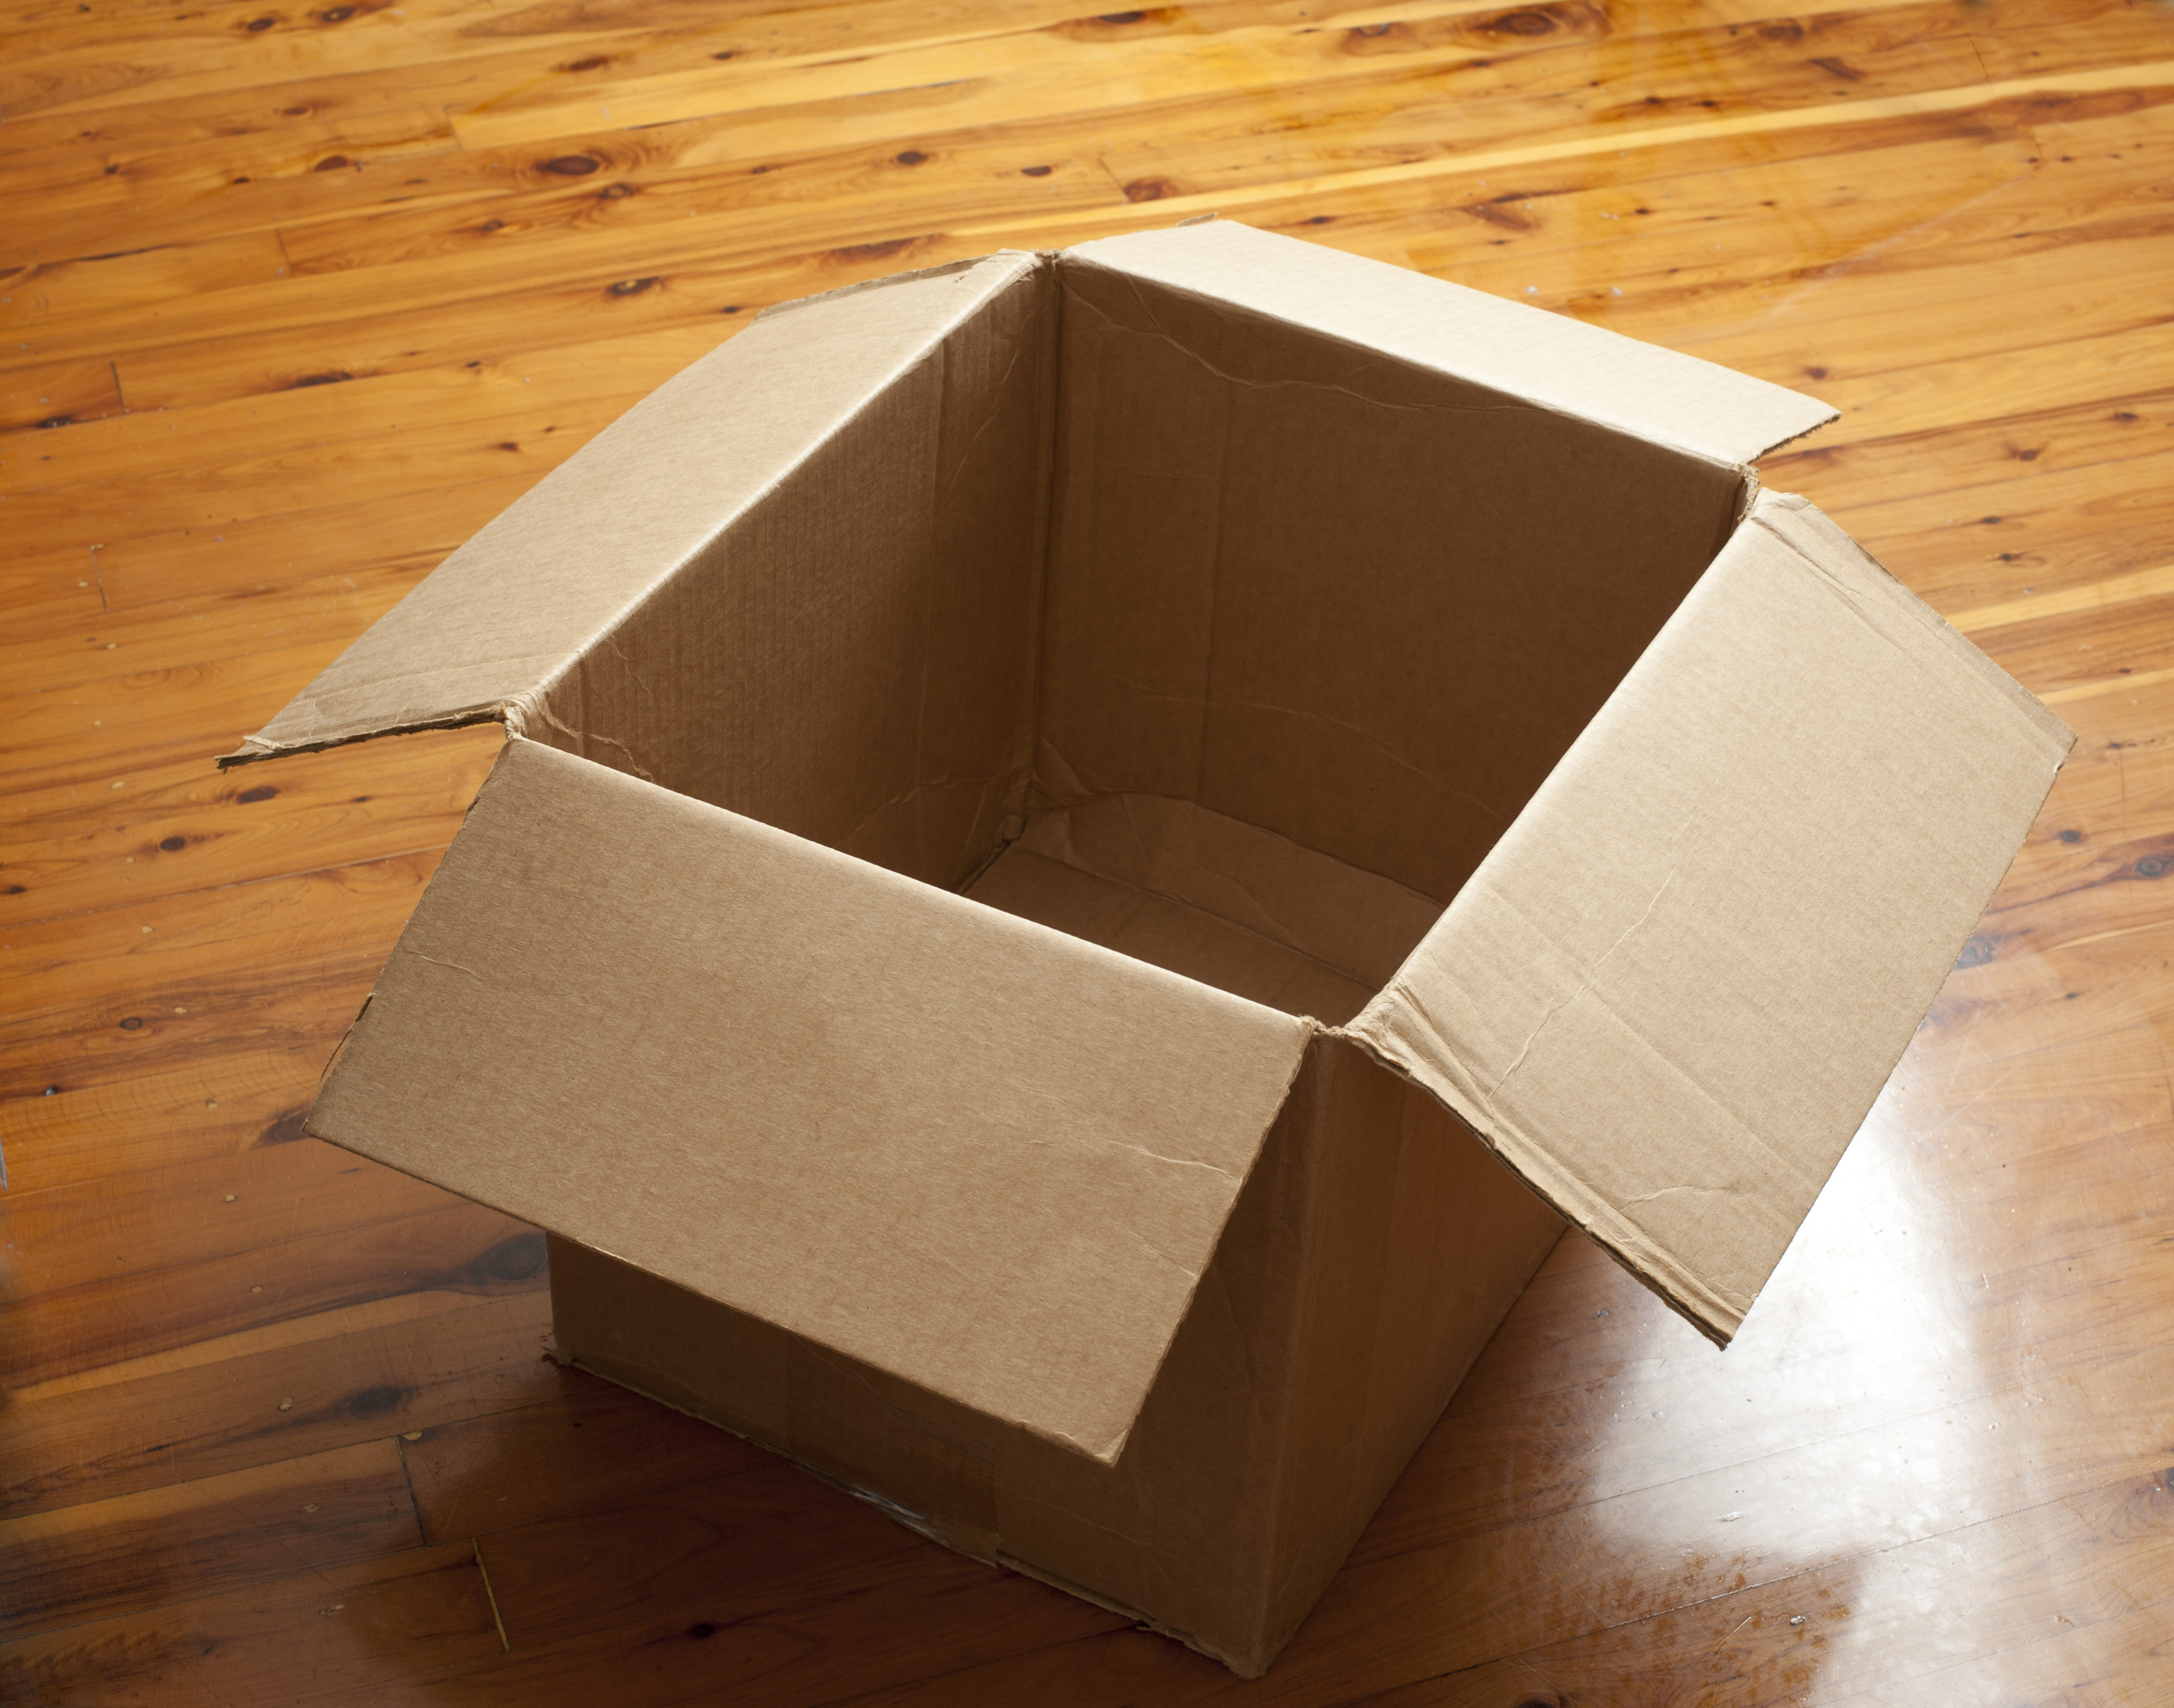 Emptied cardboard box